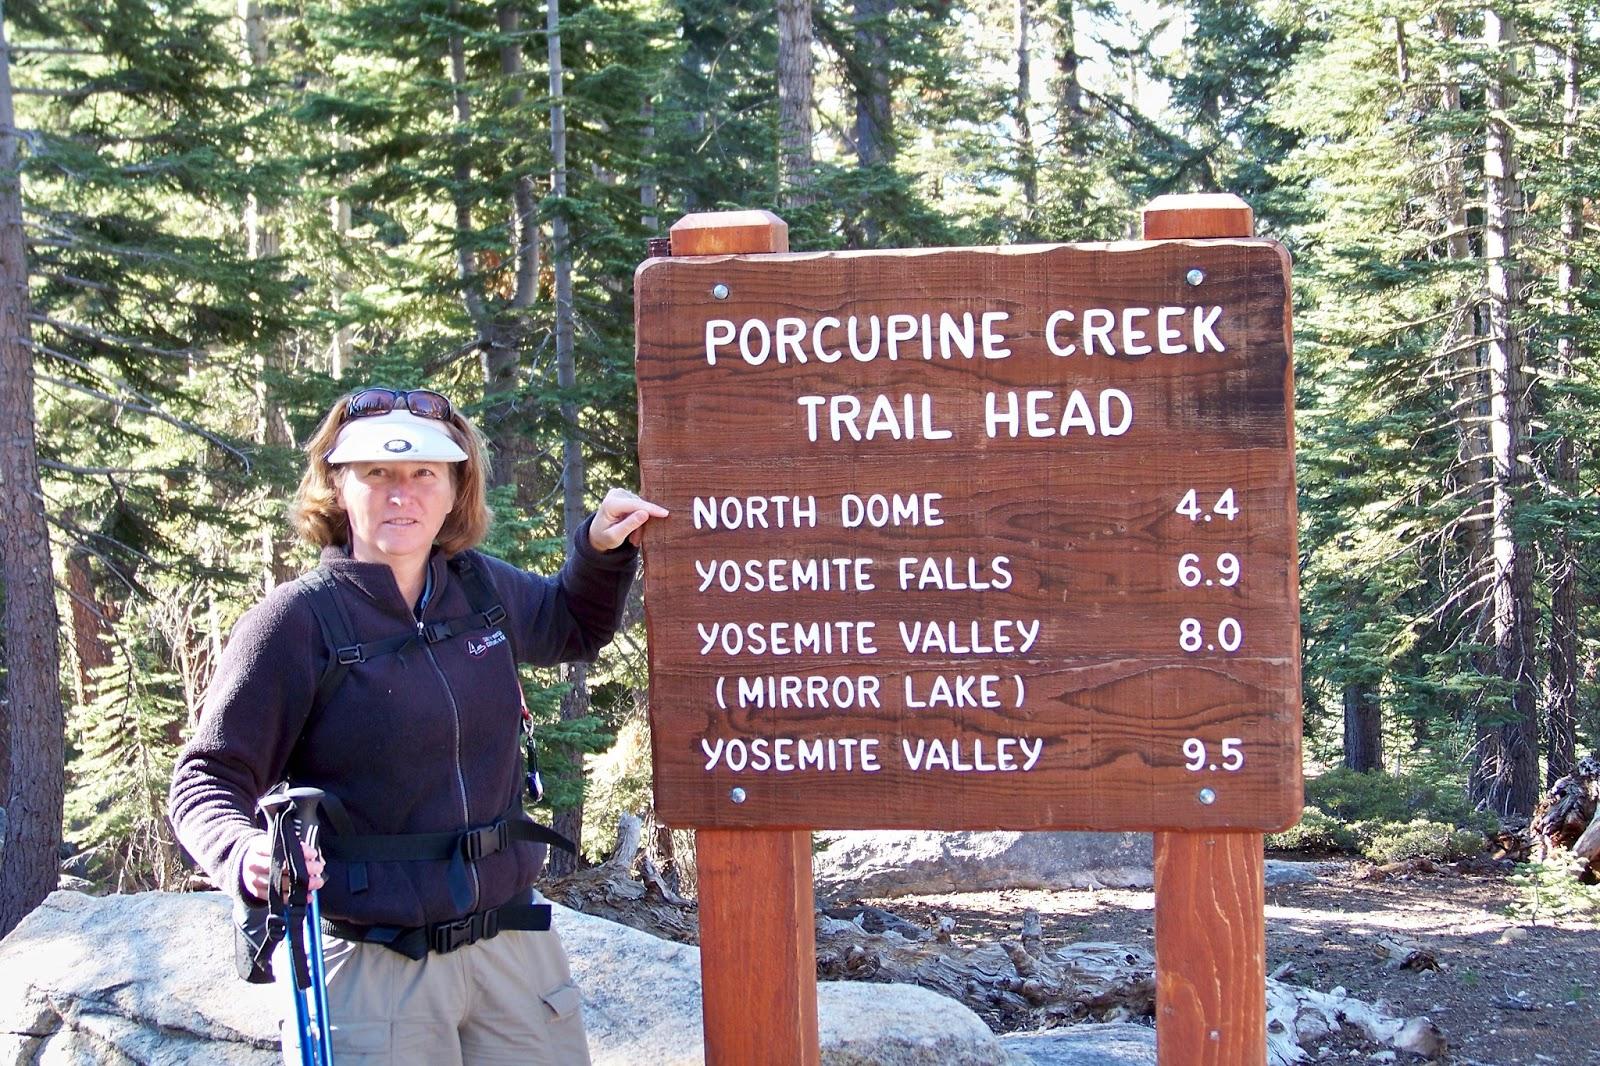 Dave Amp Kathy 2011 2018 North Dome Hike Yosemite